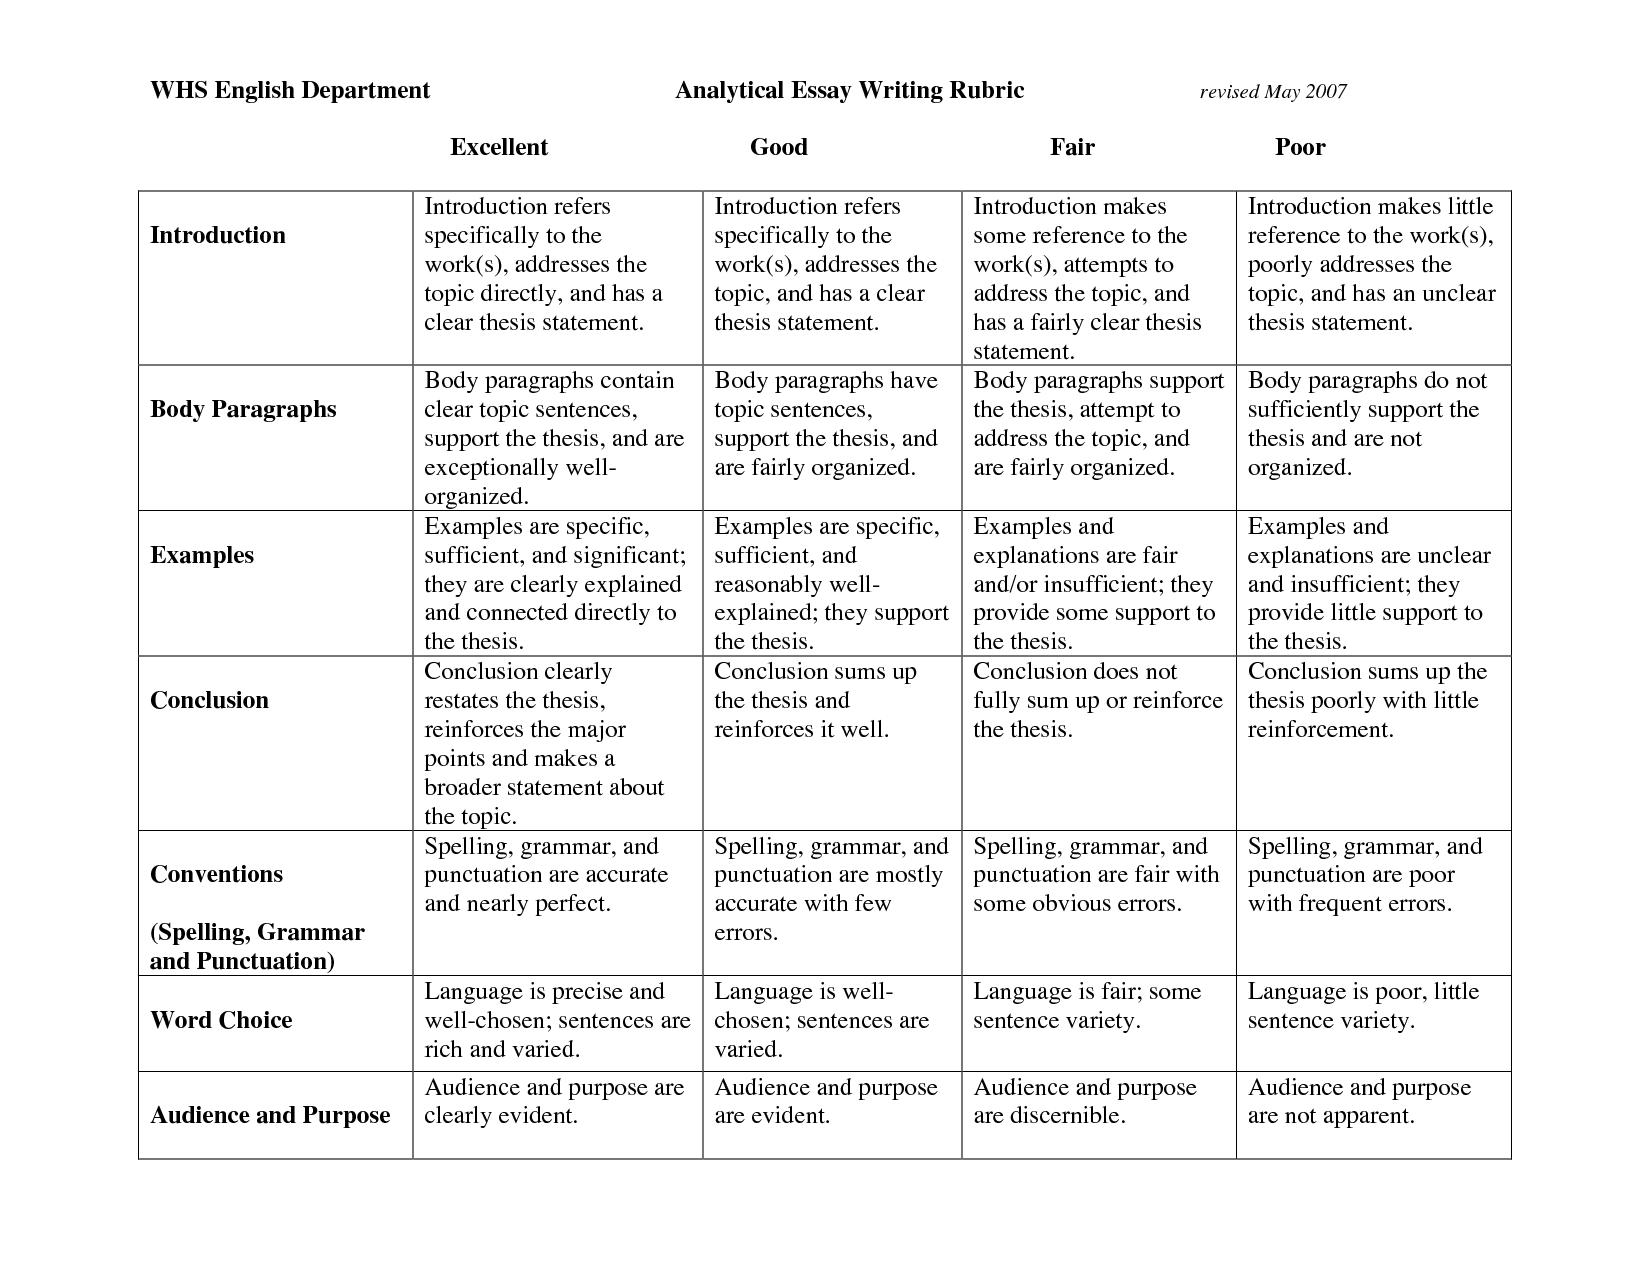 001 Rubrics In Essay Writing Formidable Holistic For Pdf Rubric Middle School Full